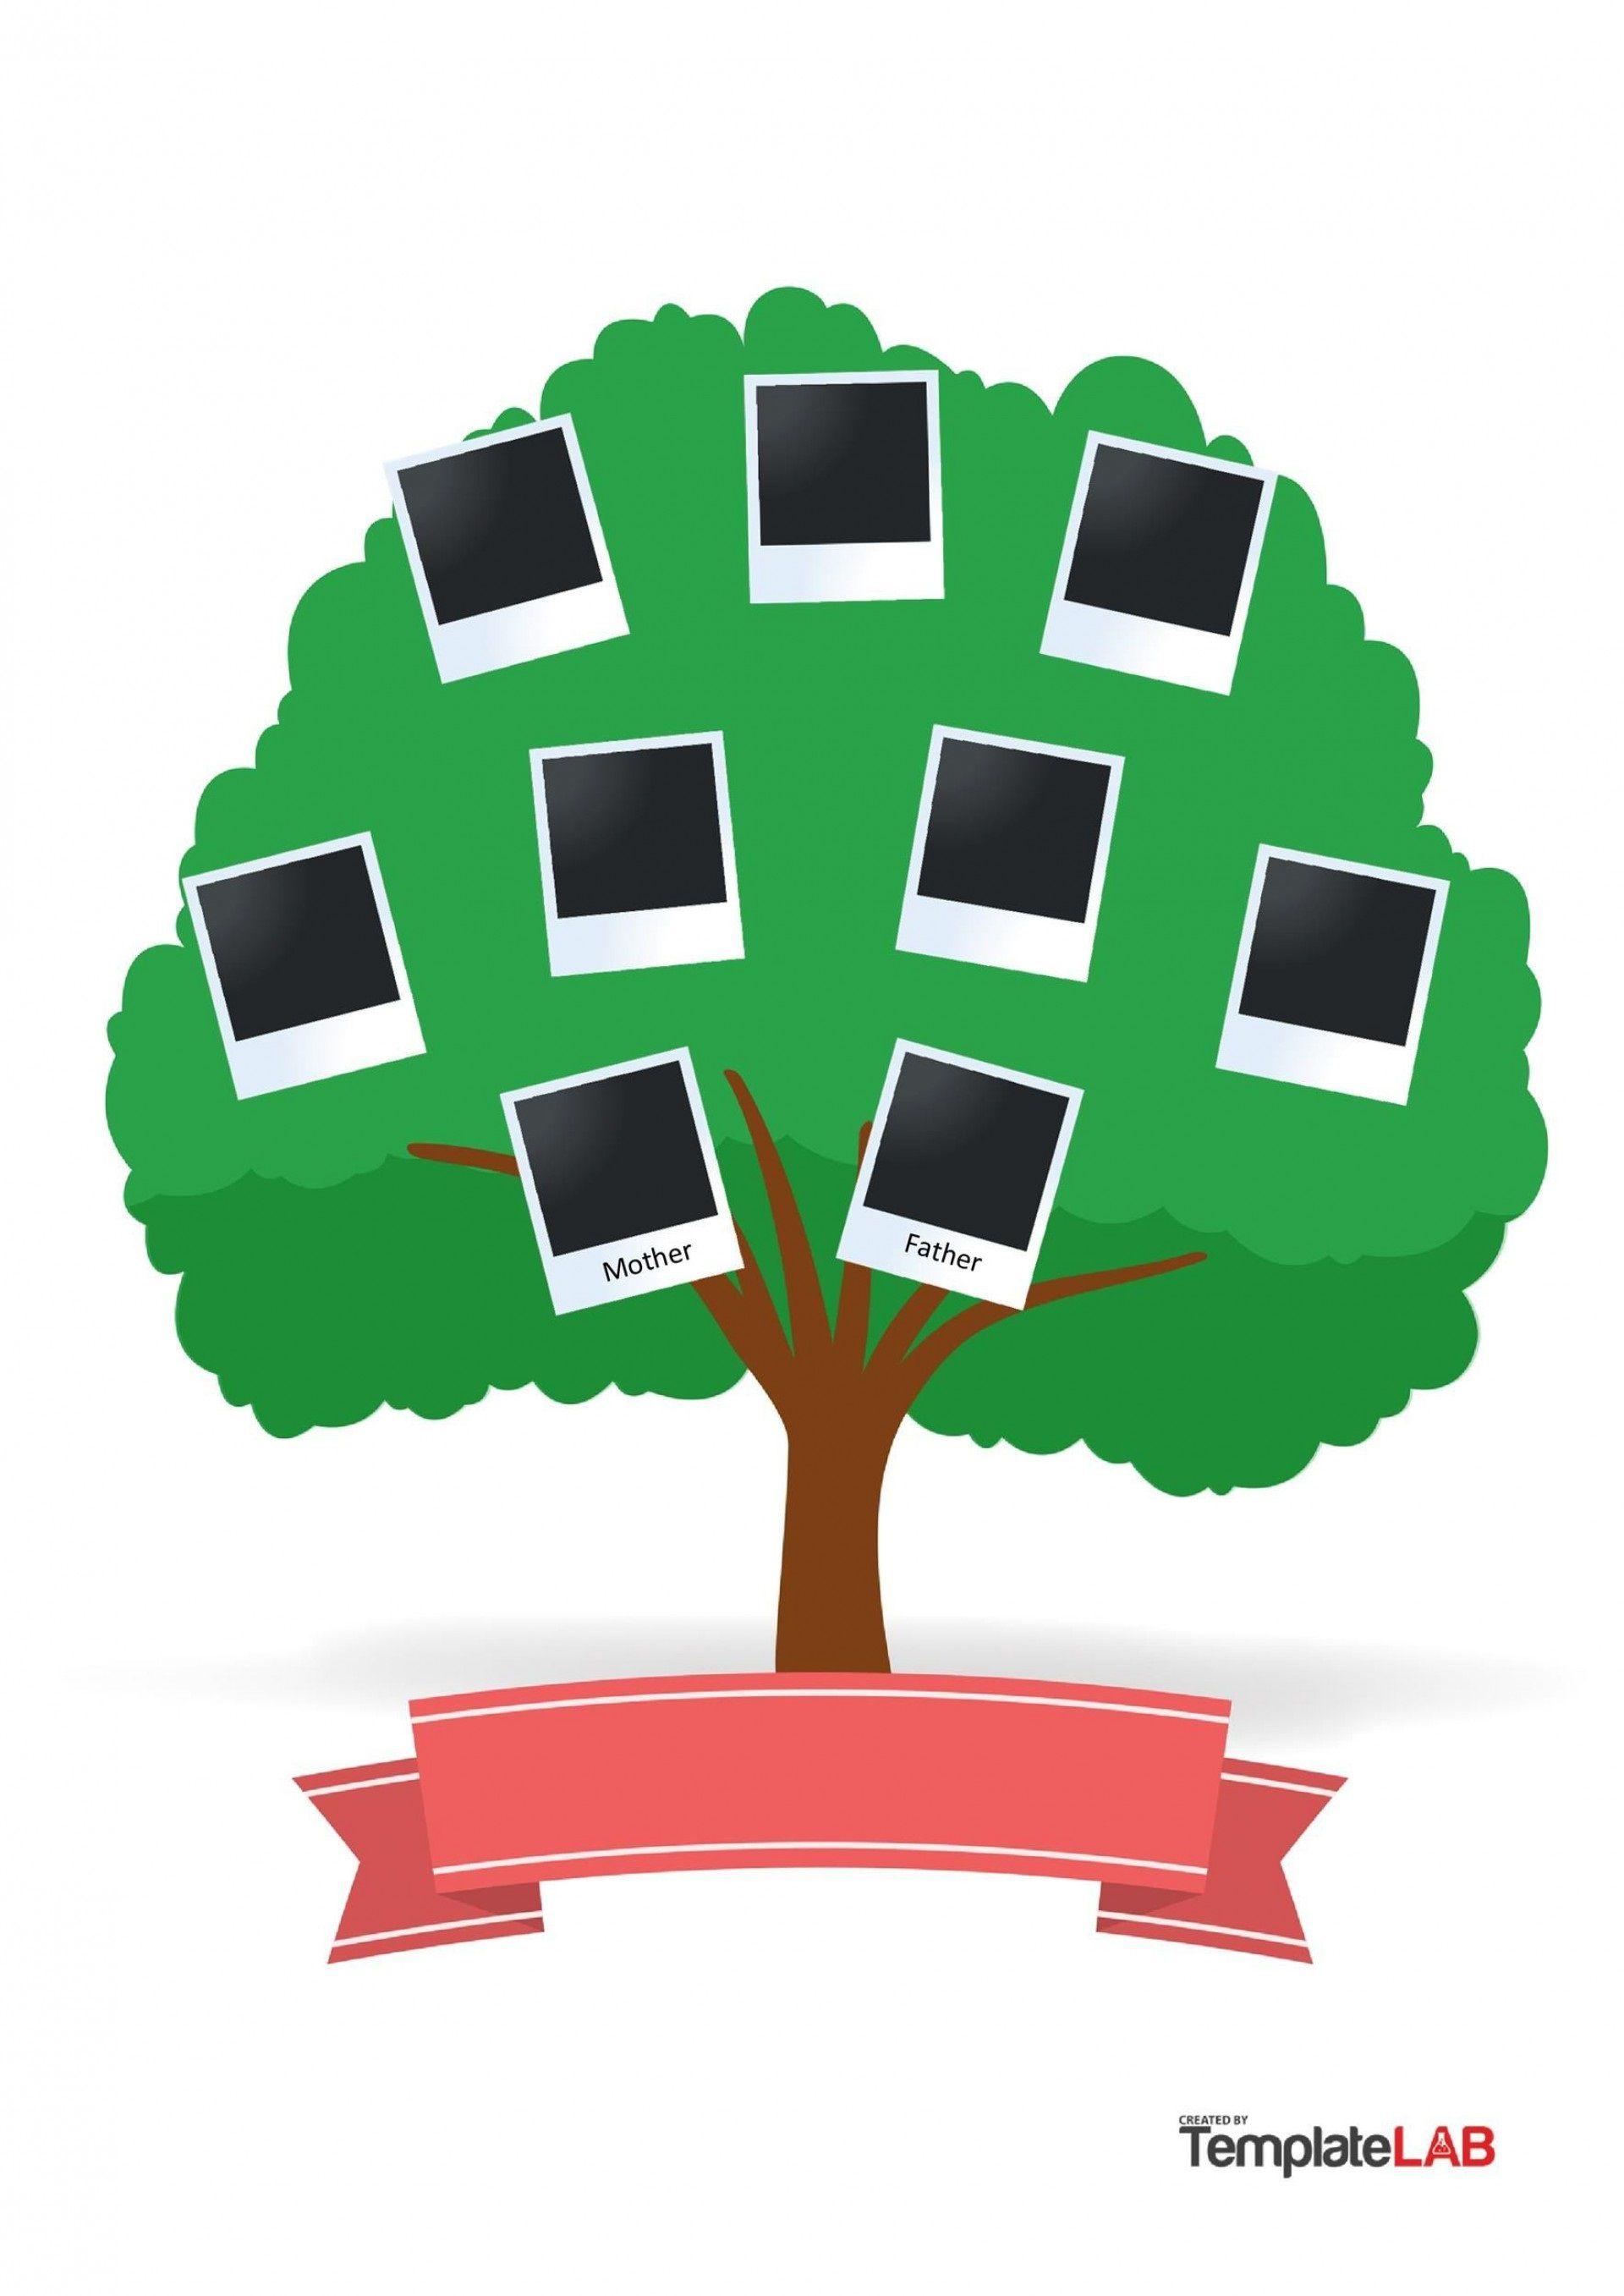 008 Fantastic Free Editable Family Tree Template For Mac Image Full